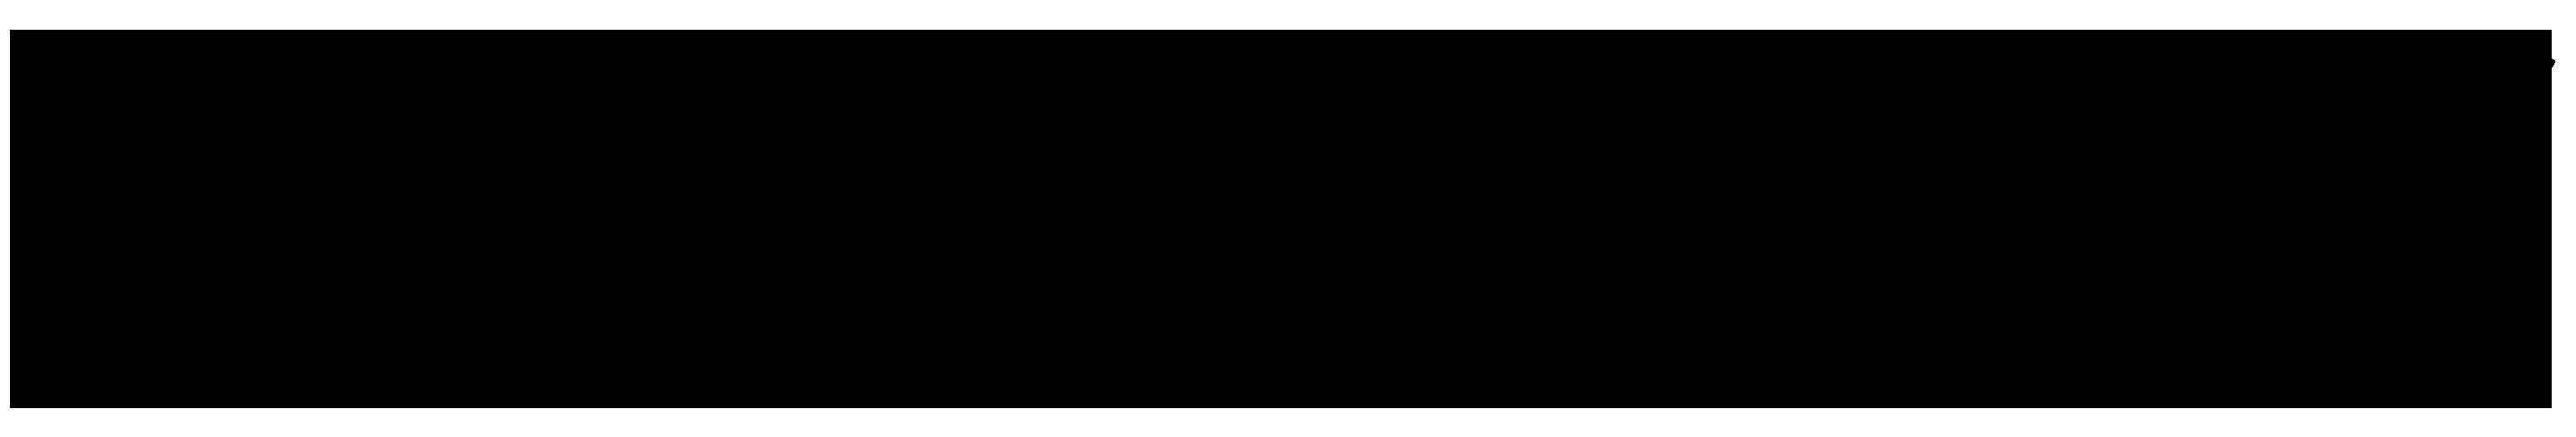 Aarhus Panorama logo